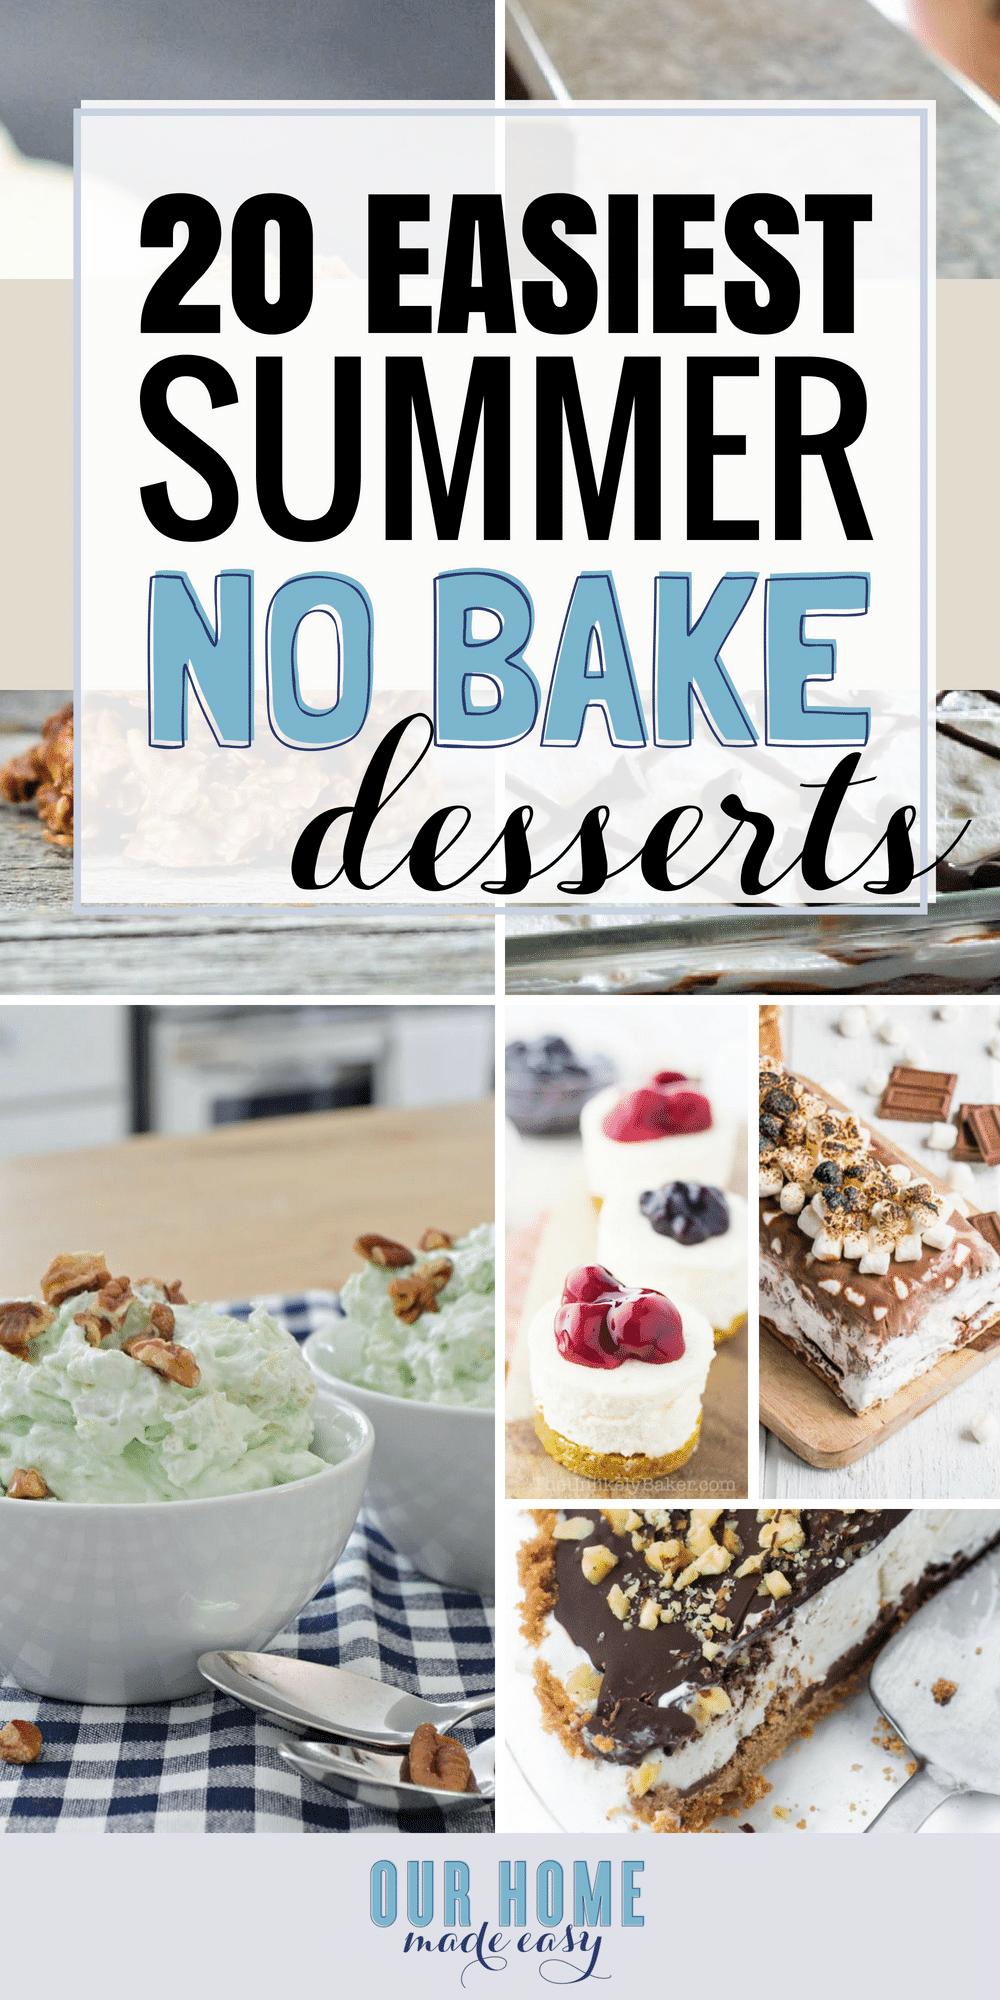 Easy No Bake dessert Recipes to make for warm Summer days